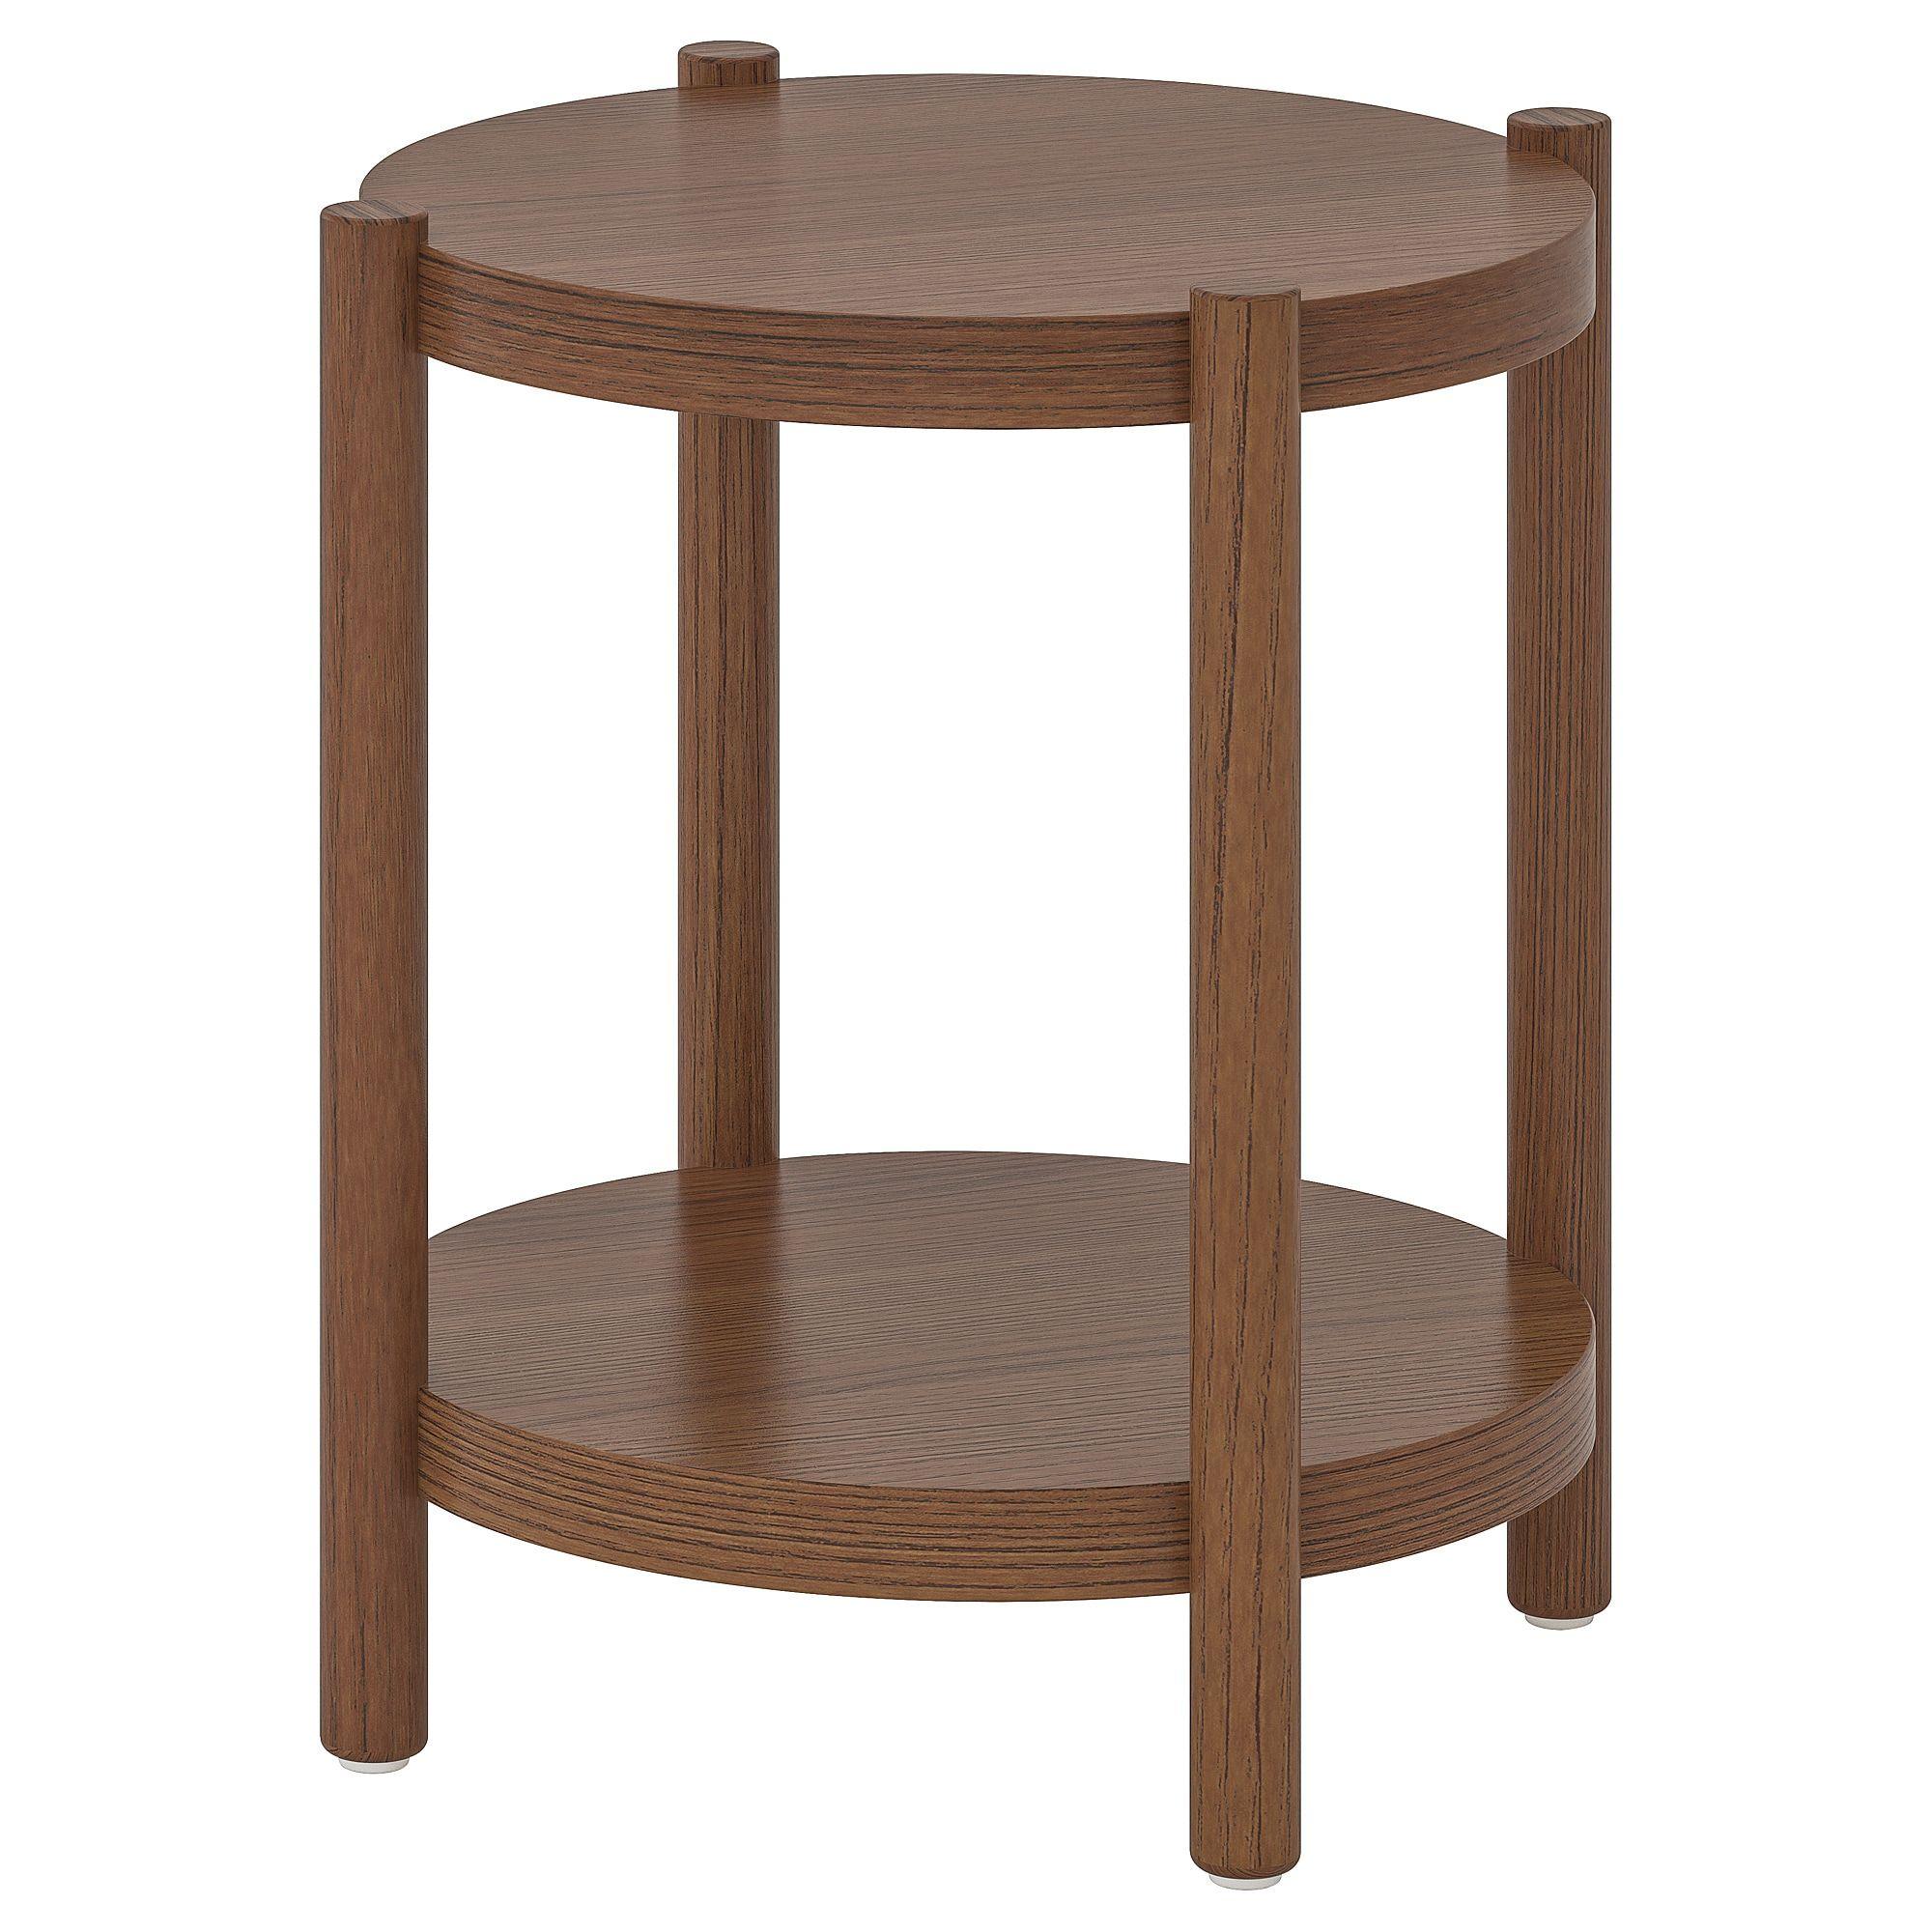 Listerby Beistelltisch Braun 50 Cm Ikea Osterreich Side Table Brown Side Table Ikea [ 2000 x 2000 Pixel ]